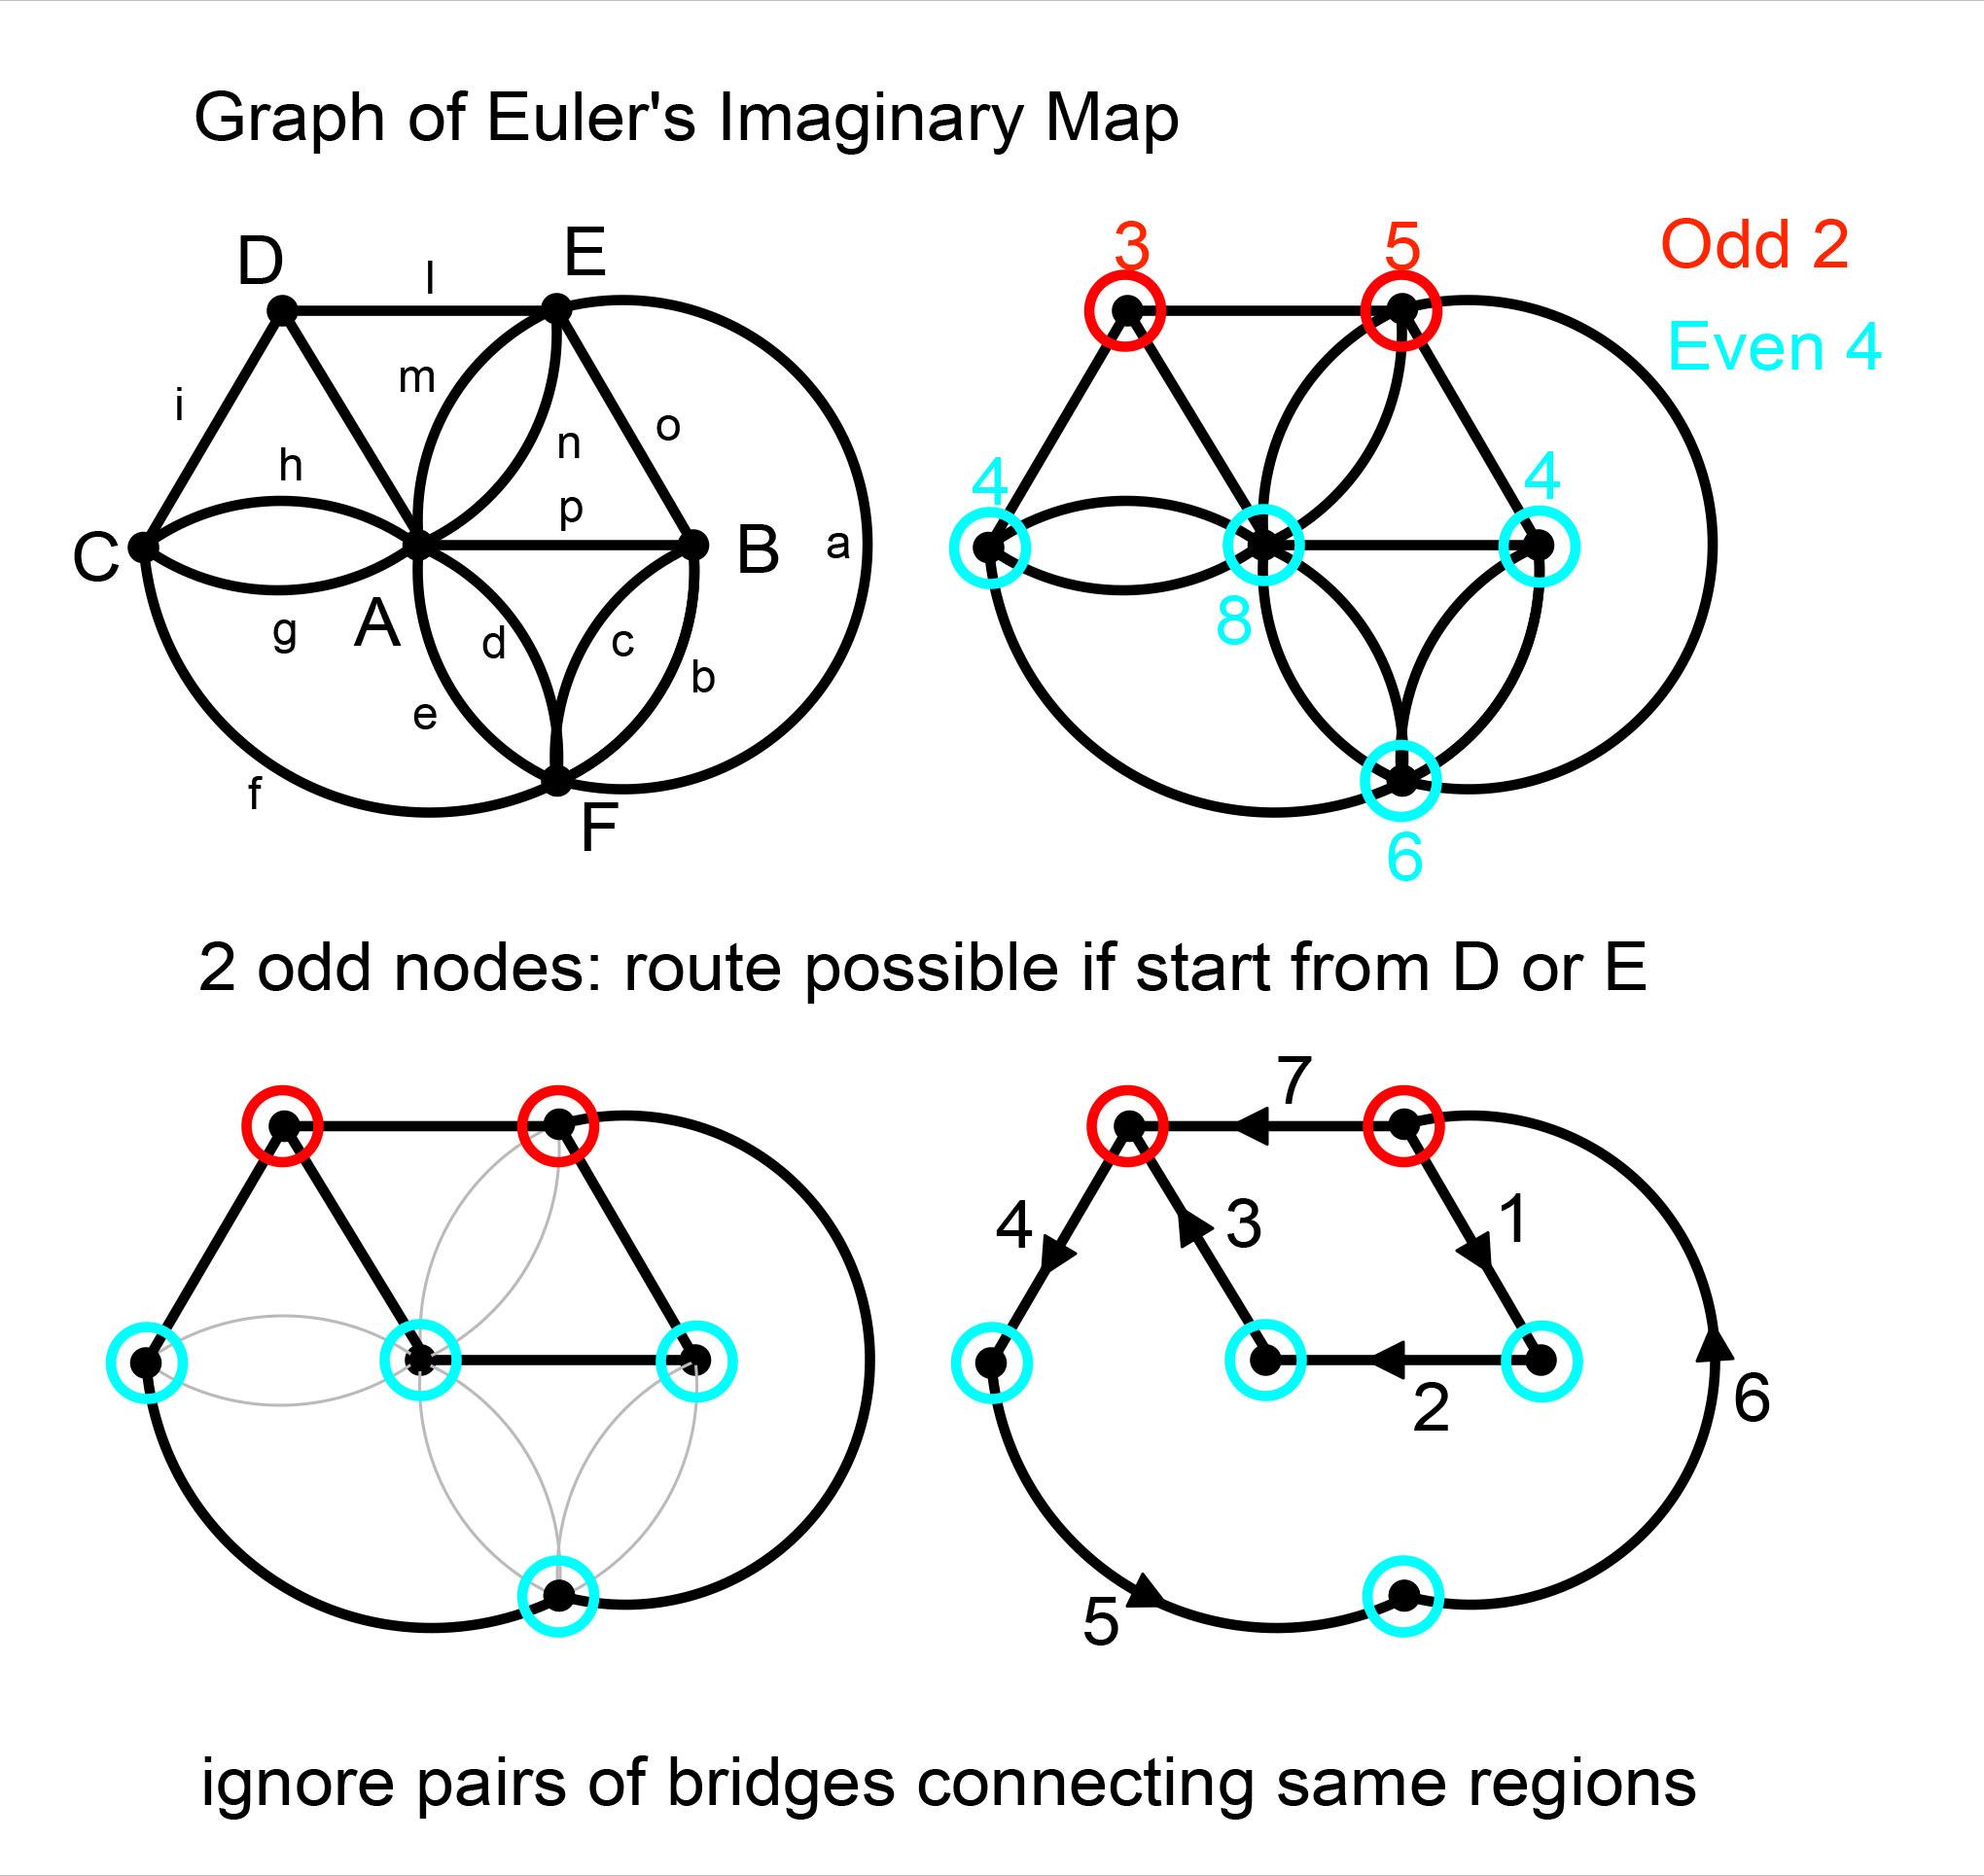 /Users/grahamshawcross/Documents/blog_drafts/konigsberg-bridges/